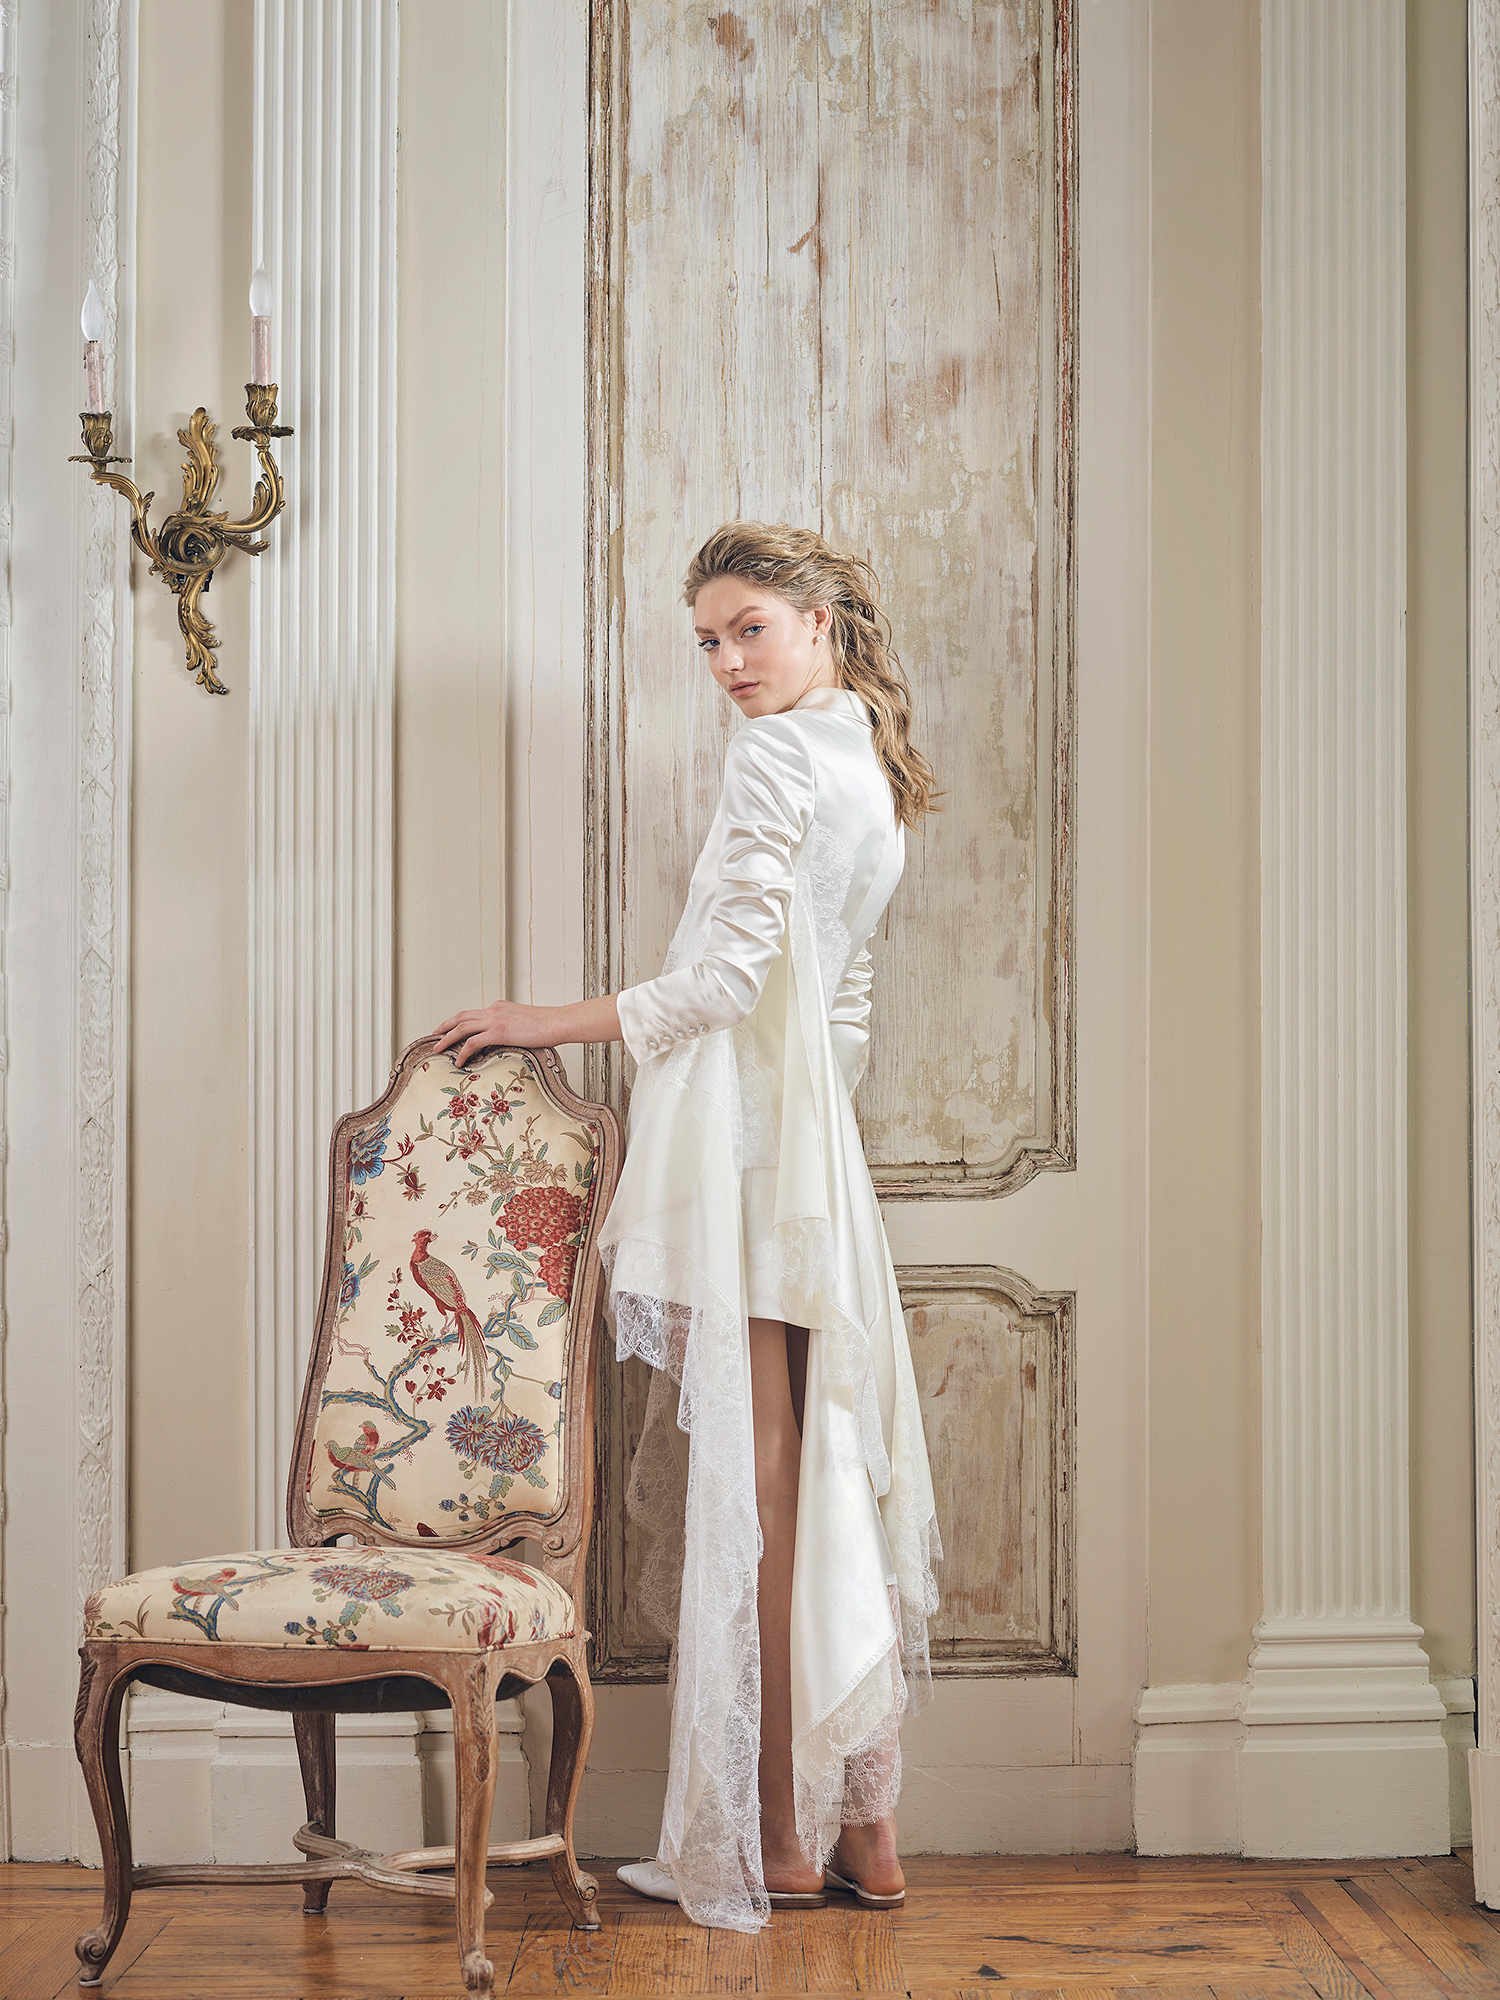 Danielle Frankel Spring 2019 Wedding Dress Collection